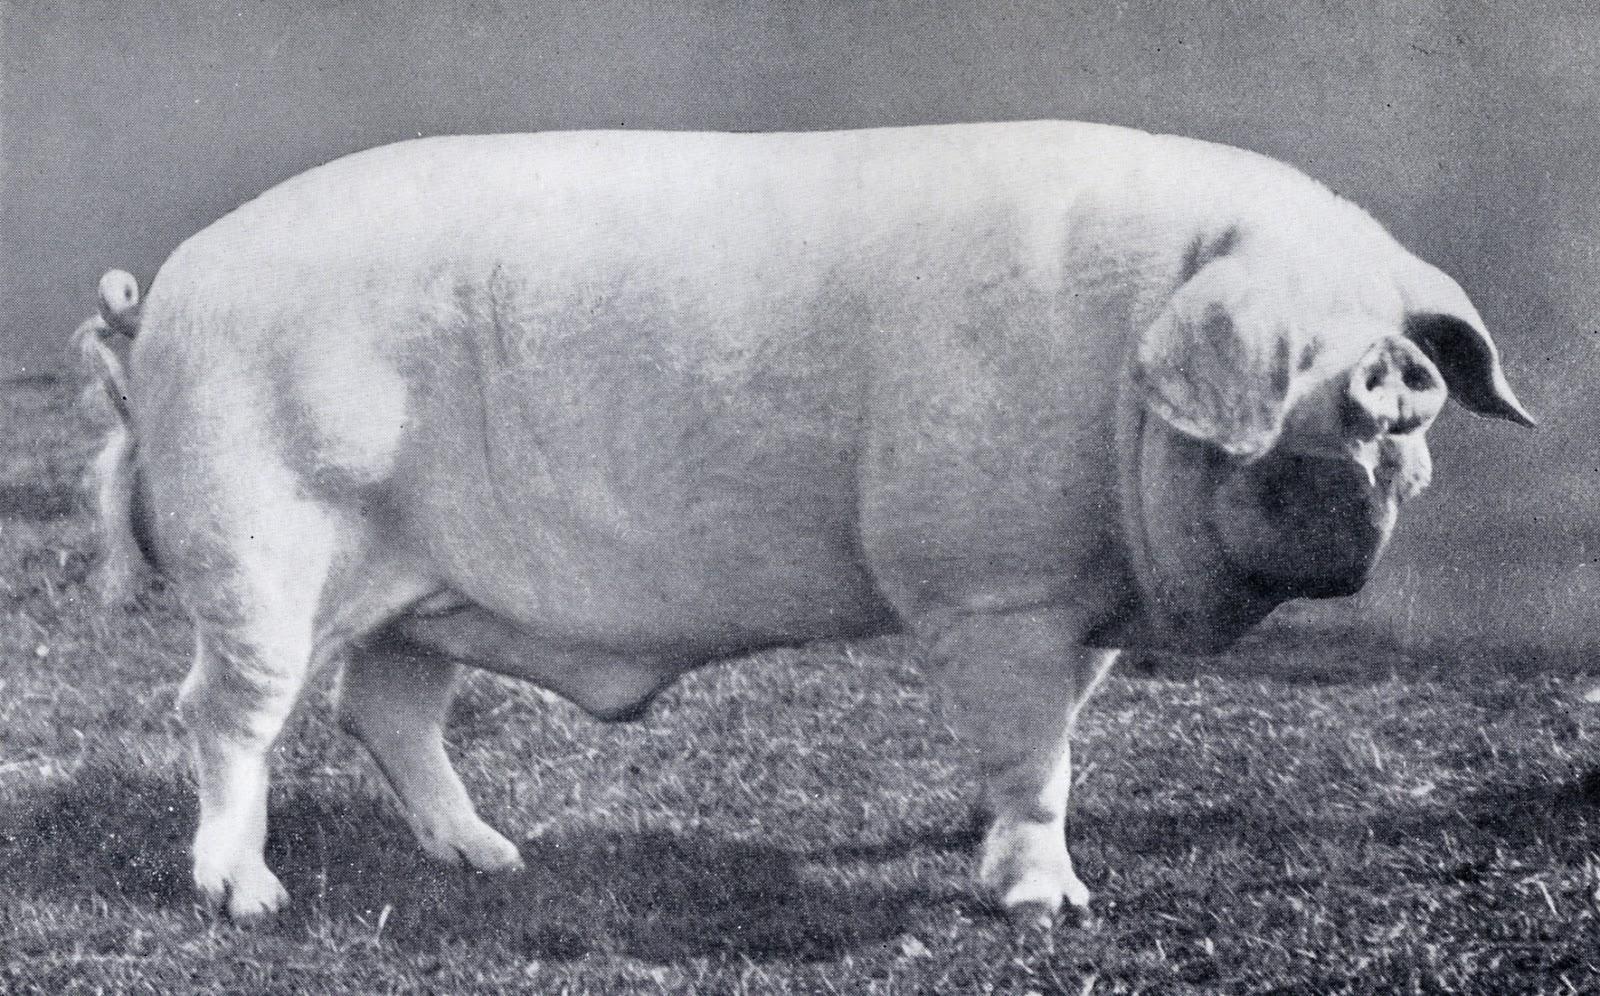 cumberland pig.jpg